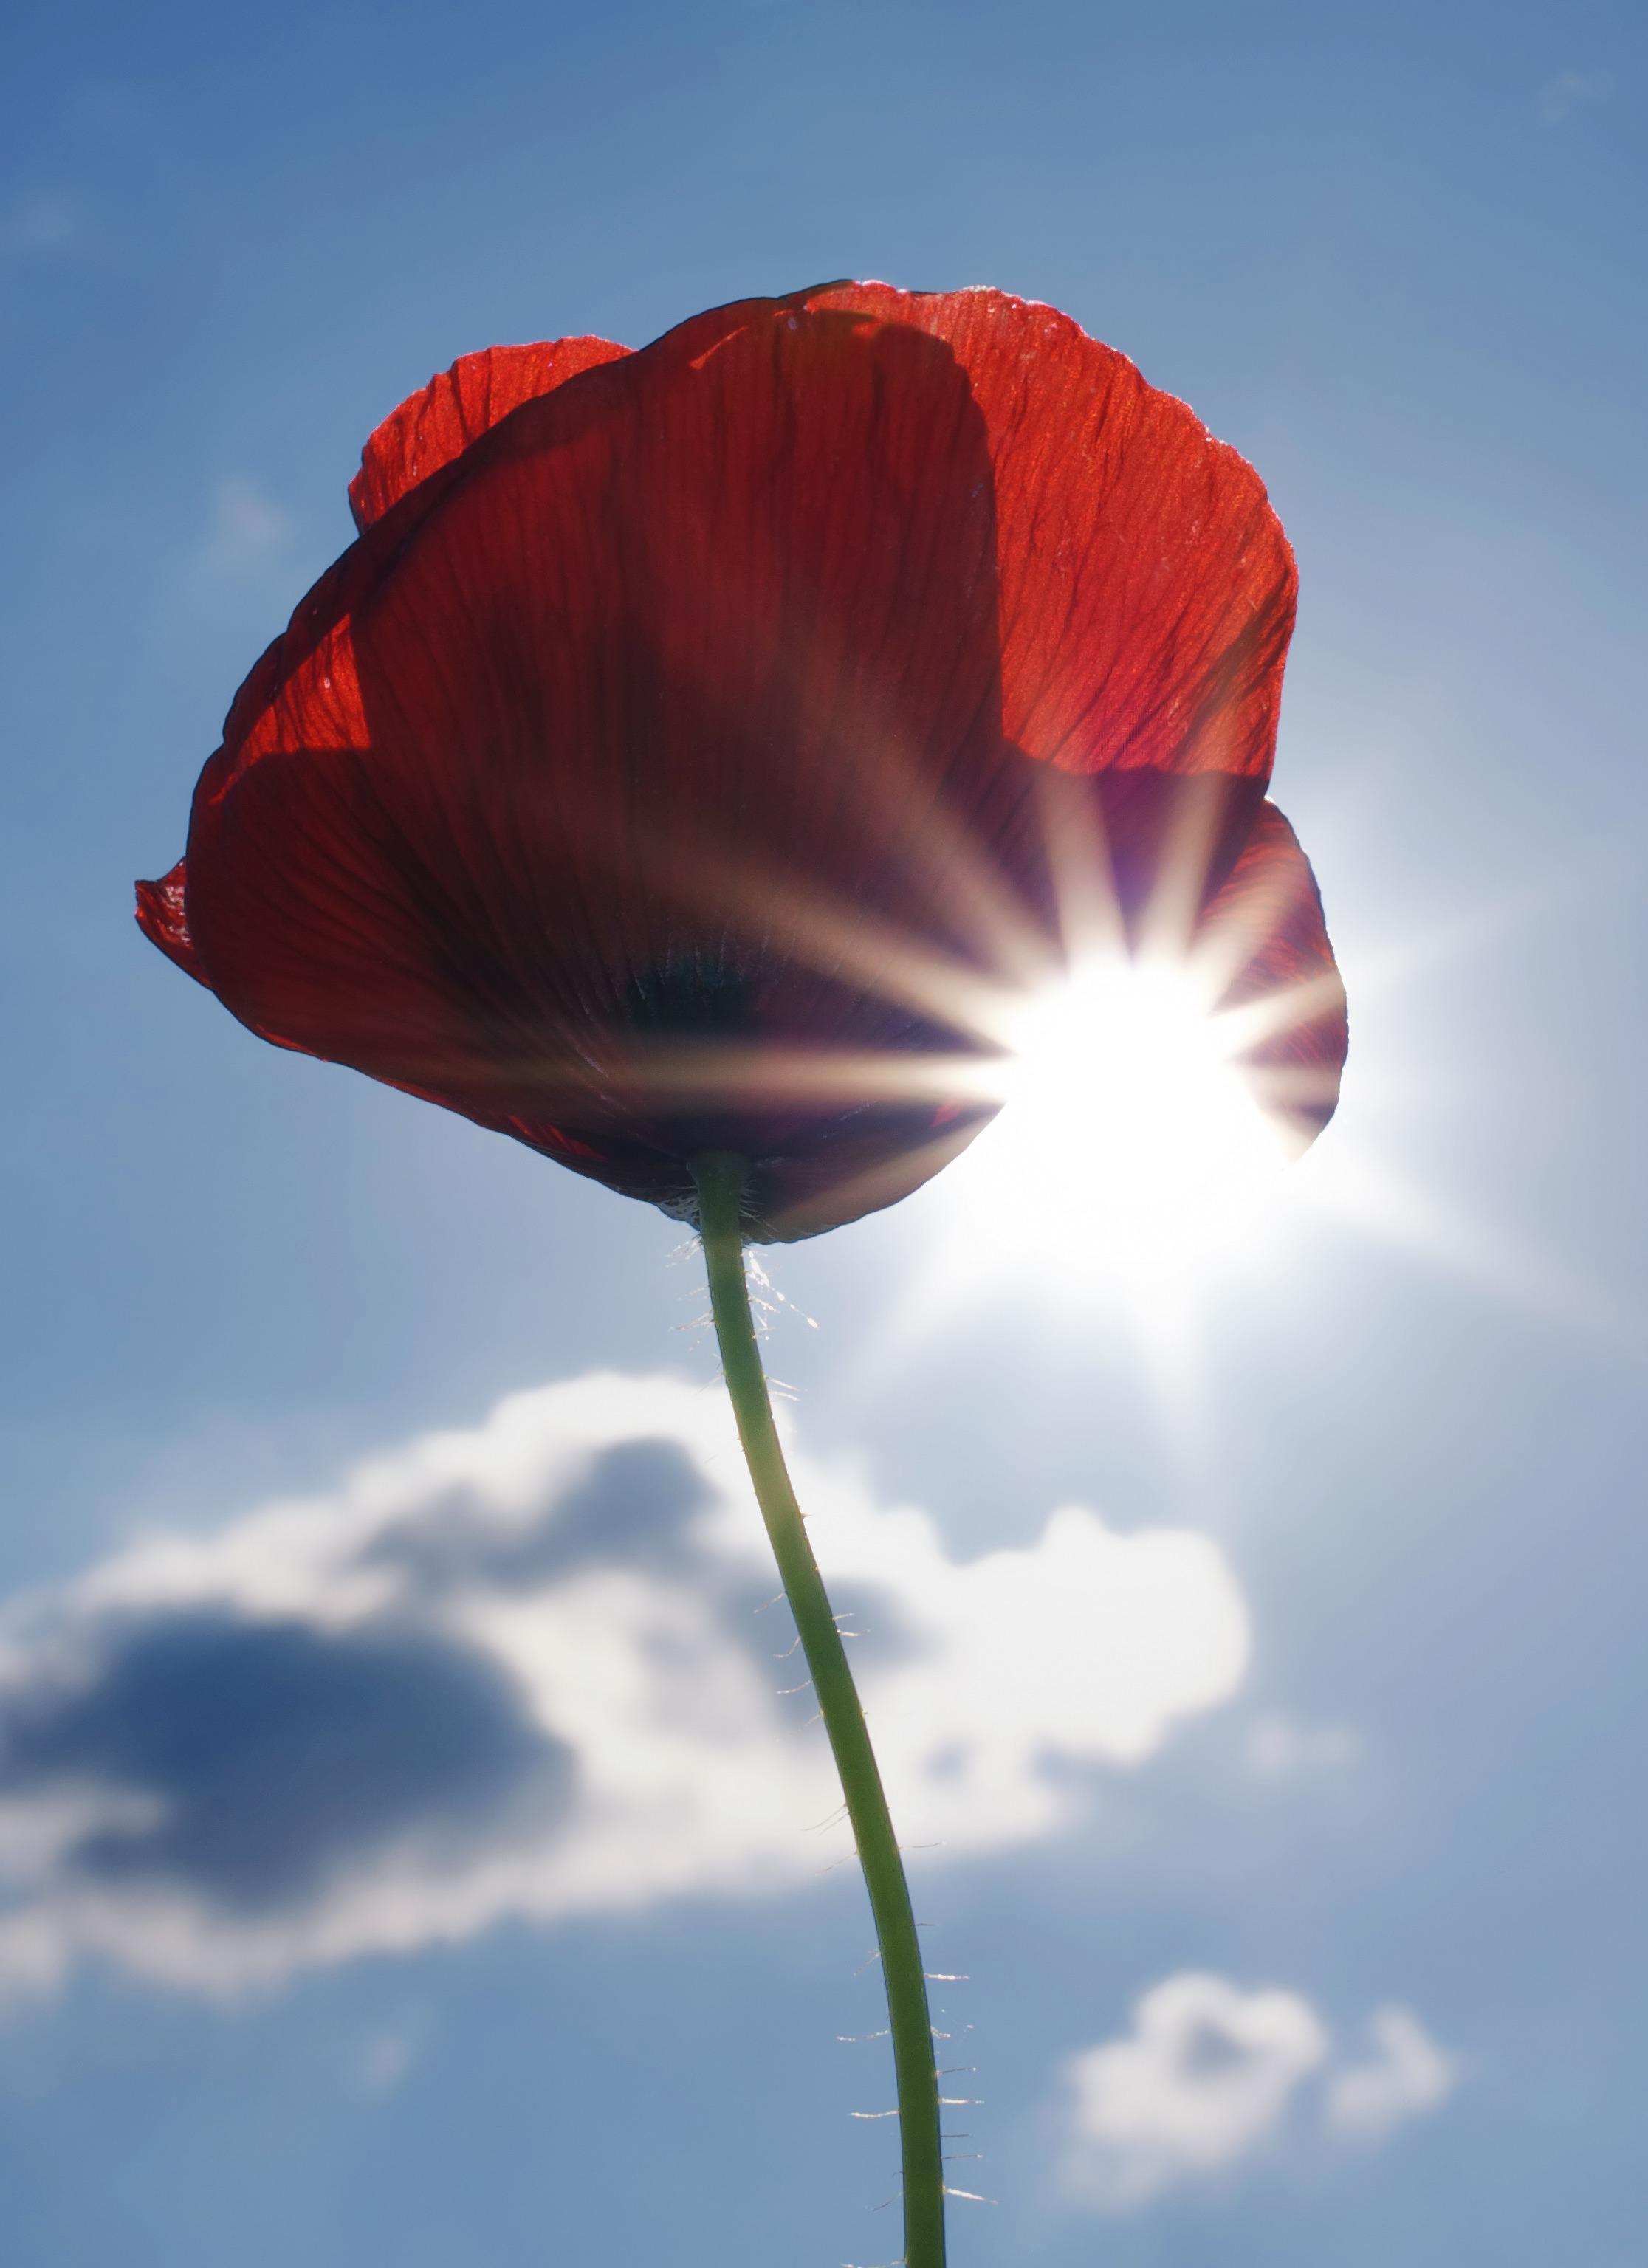 poppy_poppy_flower_flower